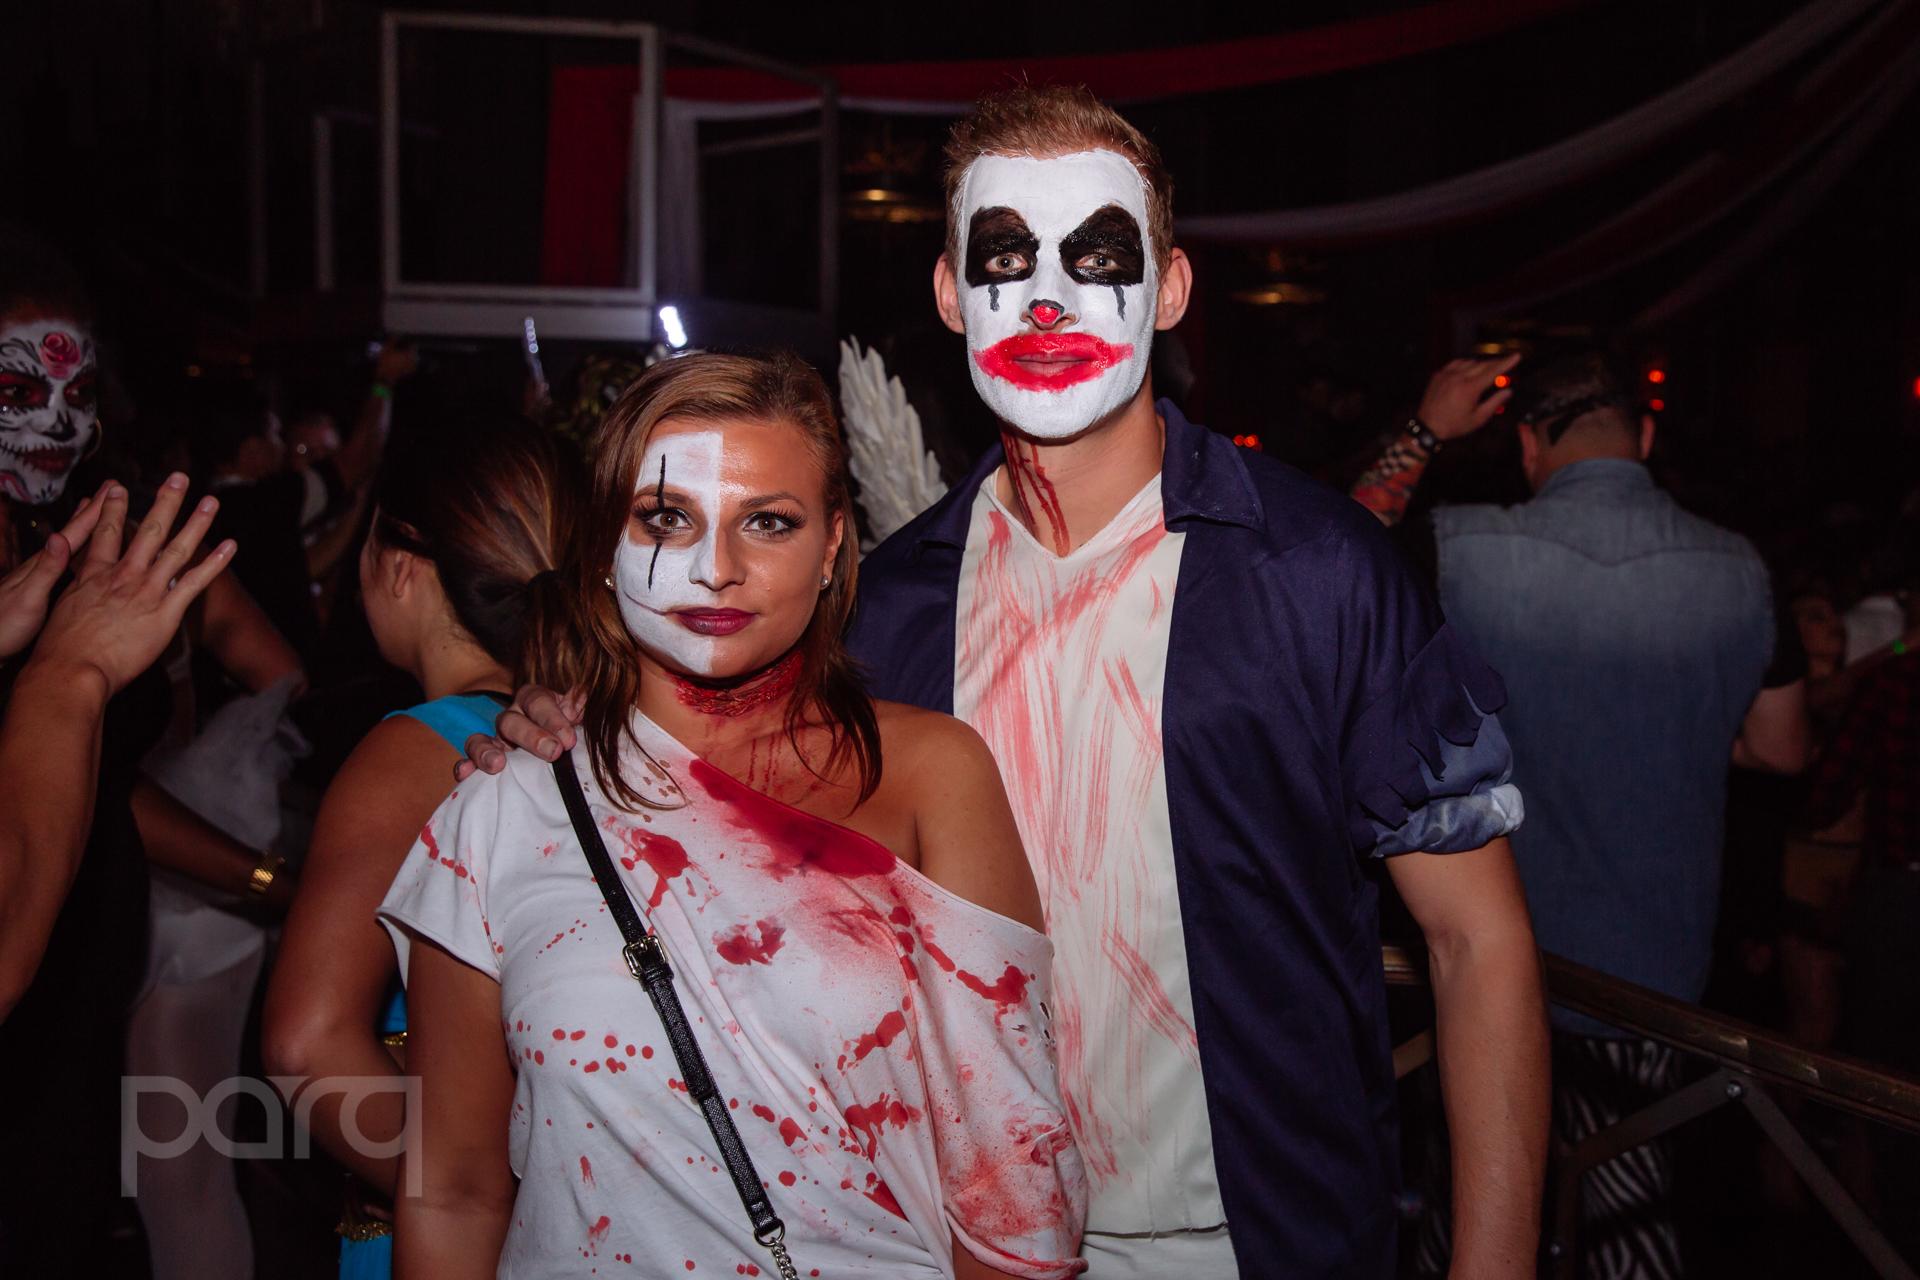 10.28.17 Parq - Haunted Circus-27.jpg